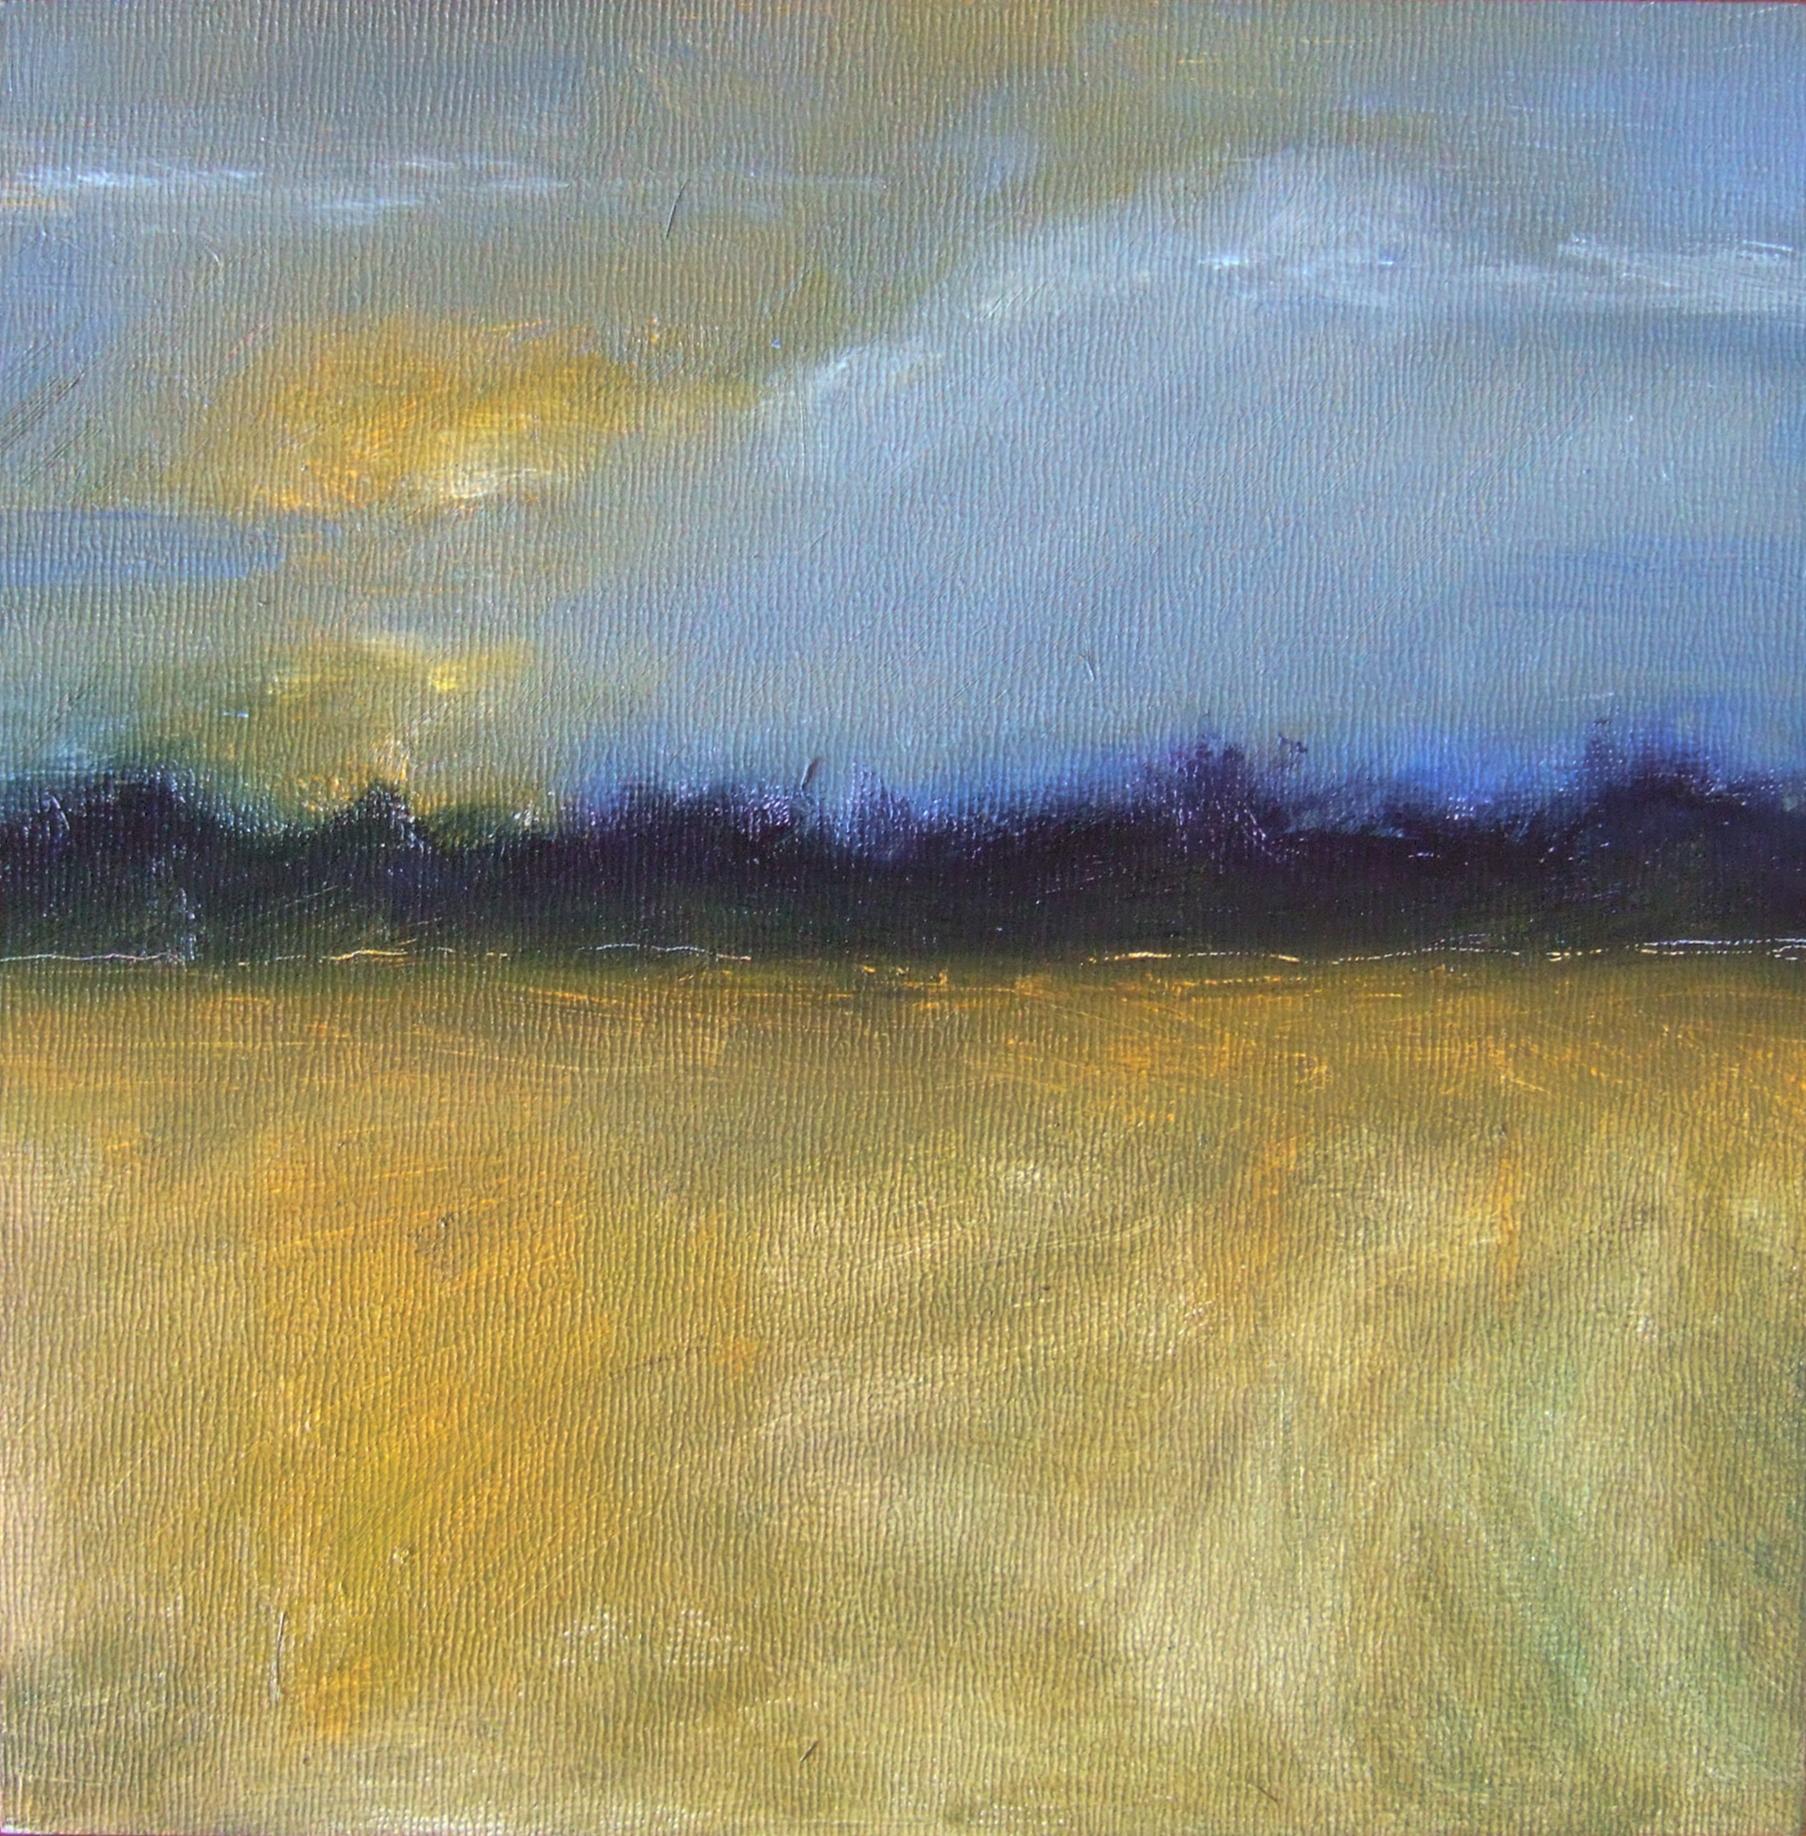 "Imaginary Landscape 8 x 8"" Oil on Board"